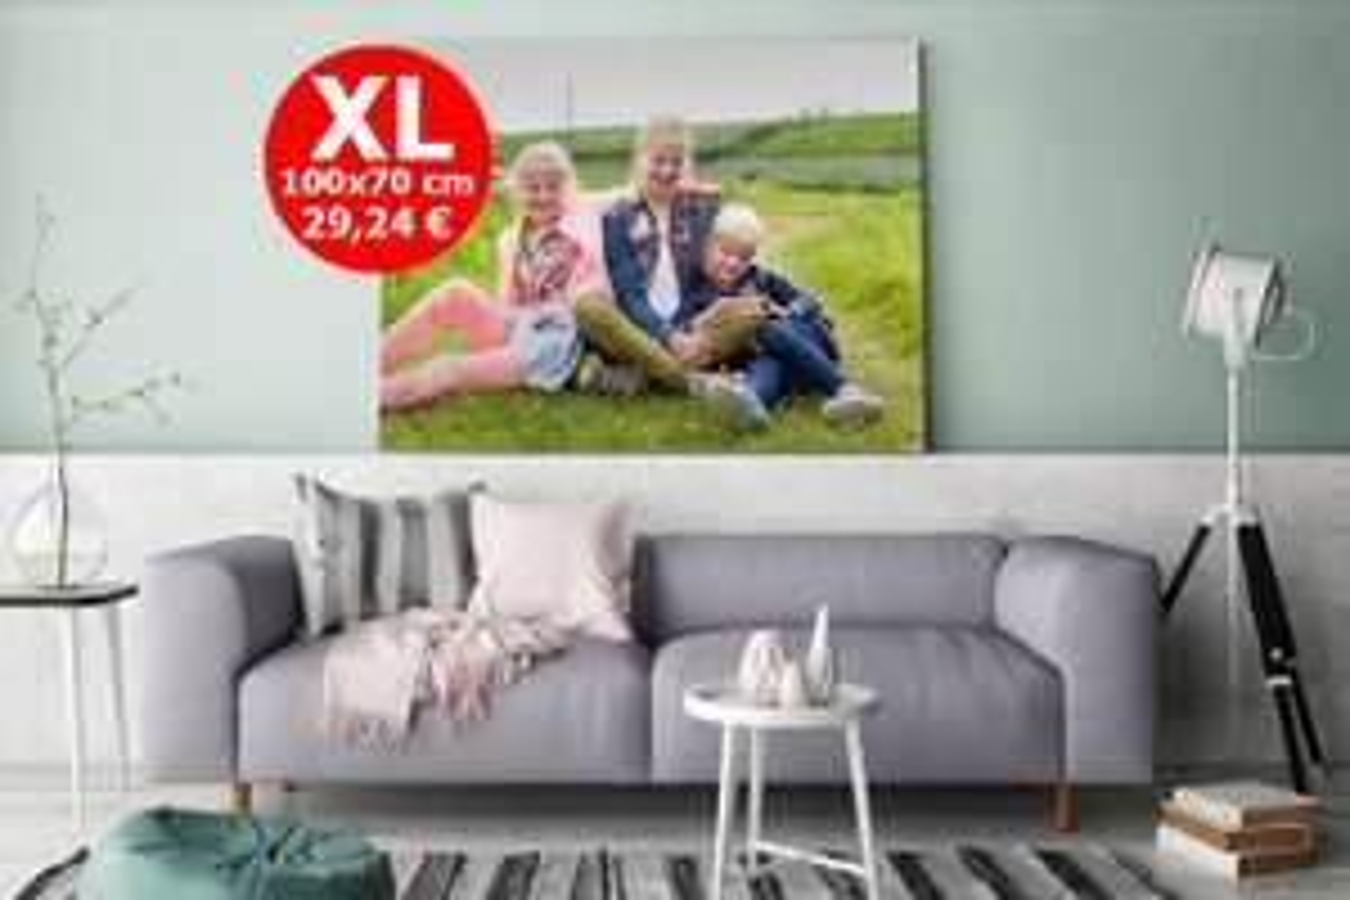 XL-Foto auf Aluminium - 3mm Dicke fur 36,19€ incl. VSK